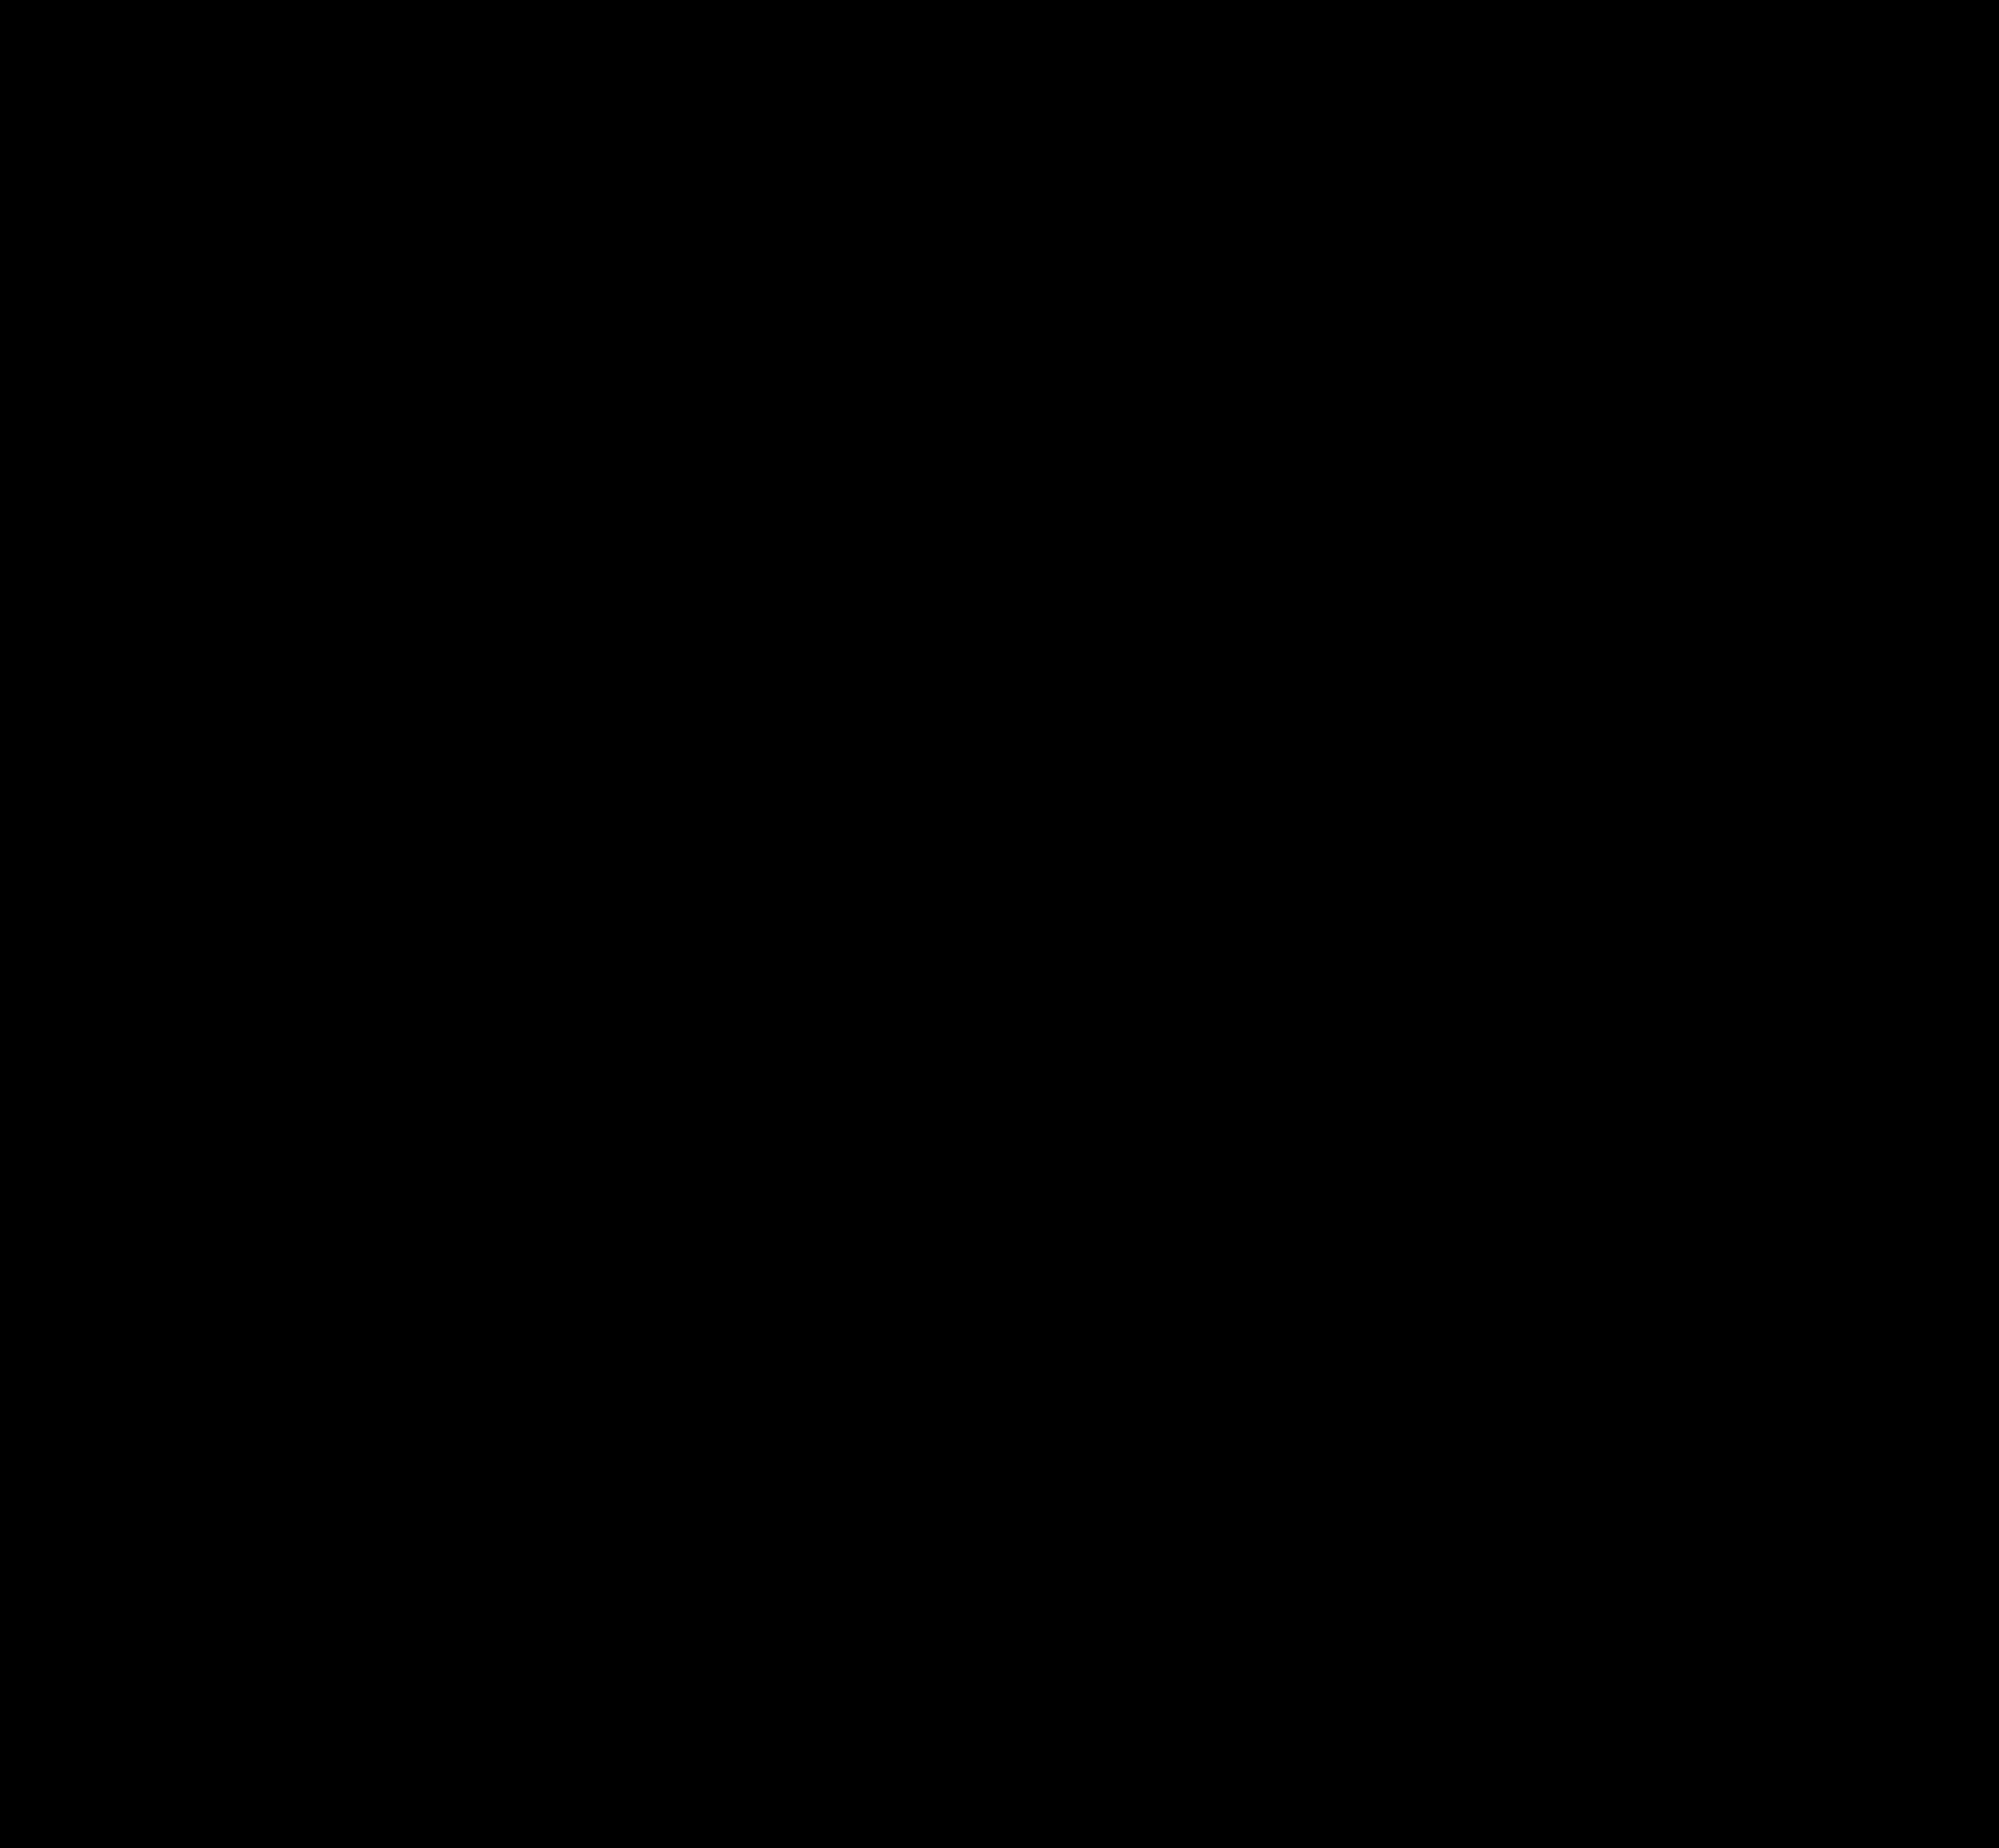 Animation-logo-black (1).png